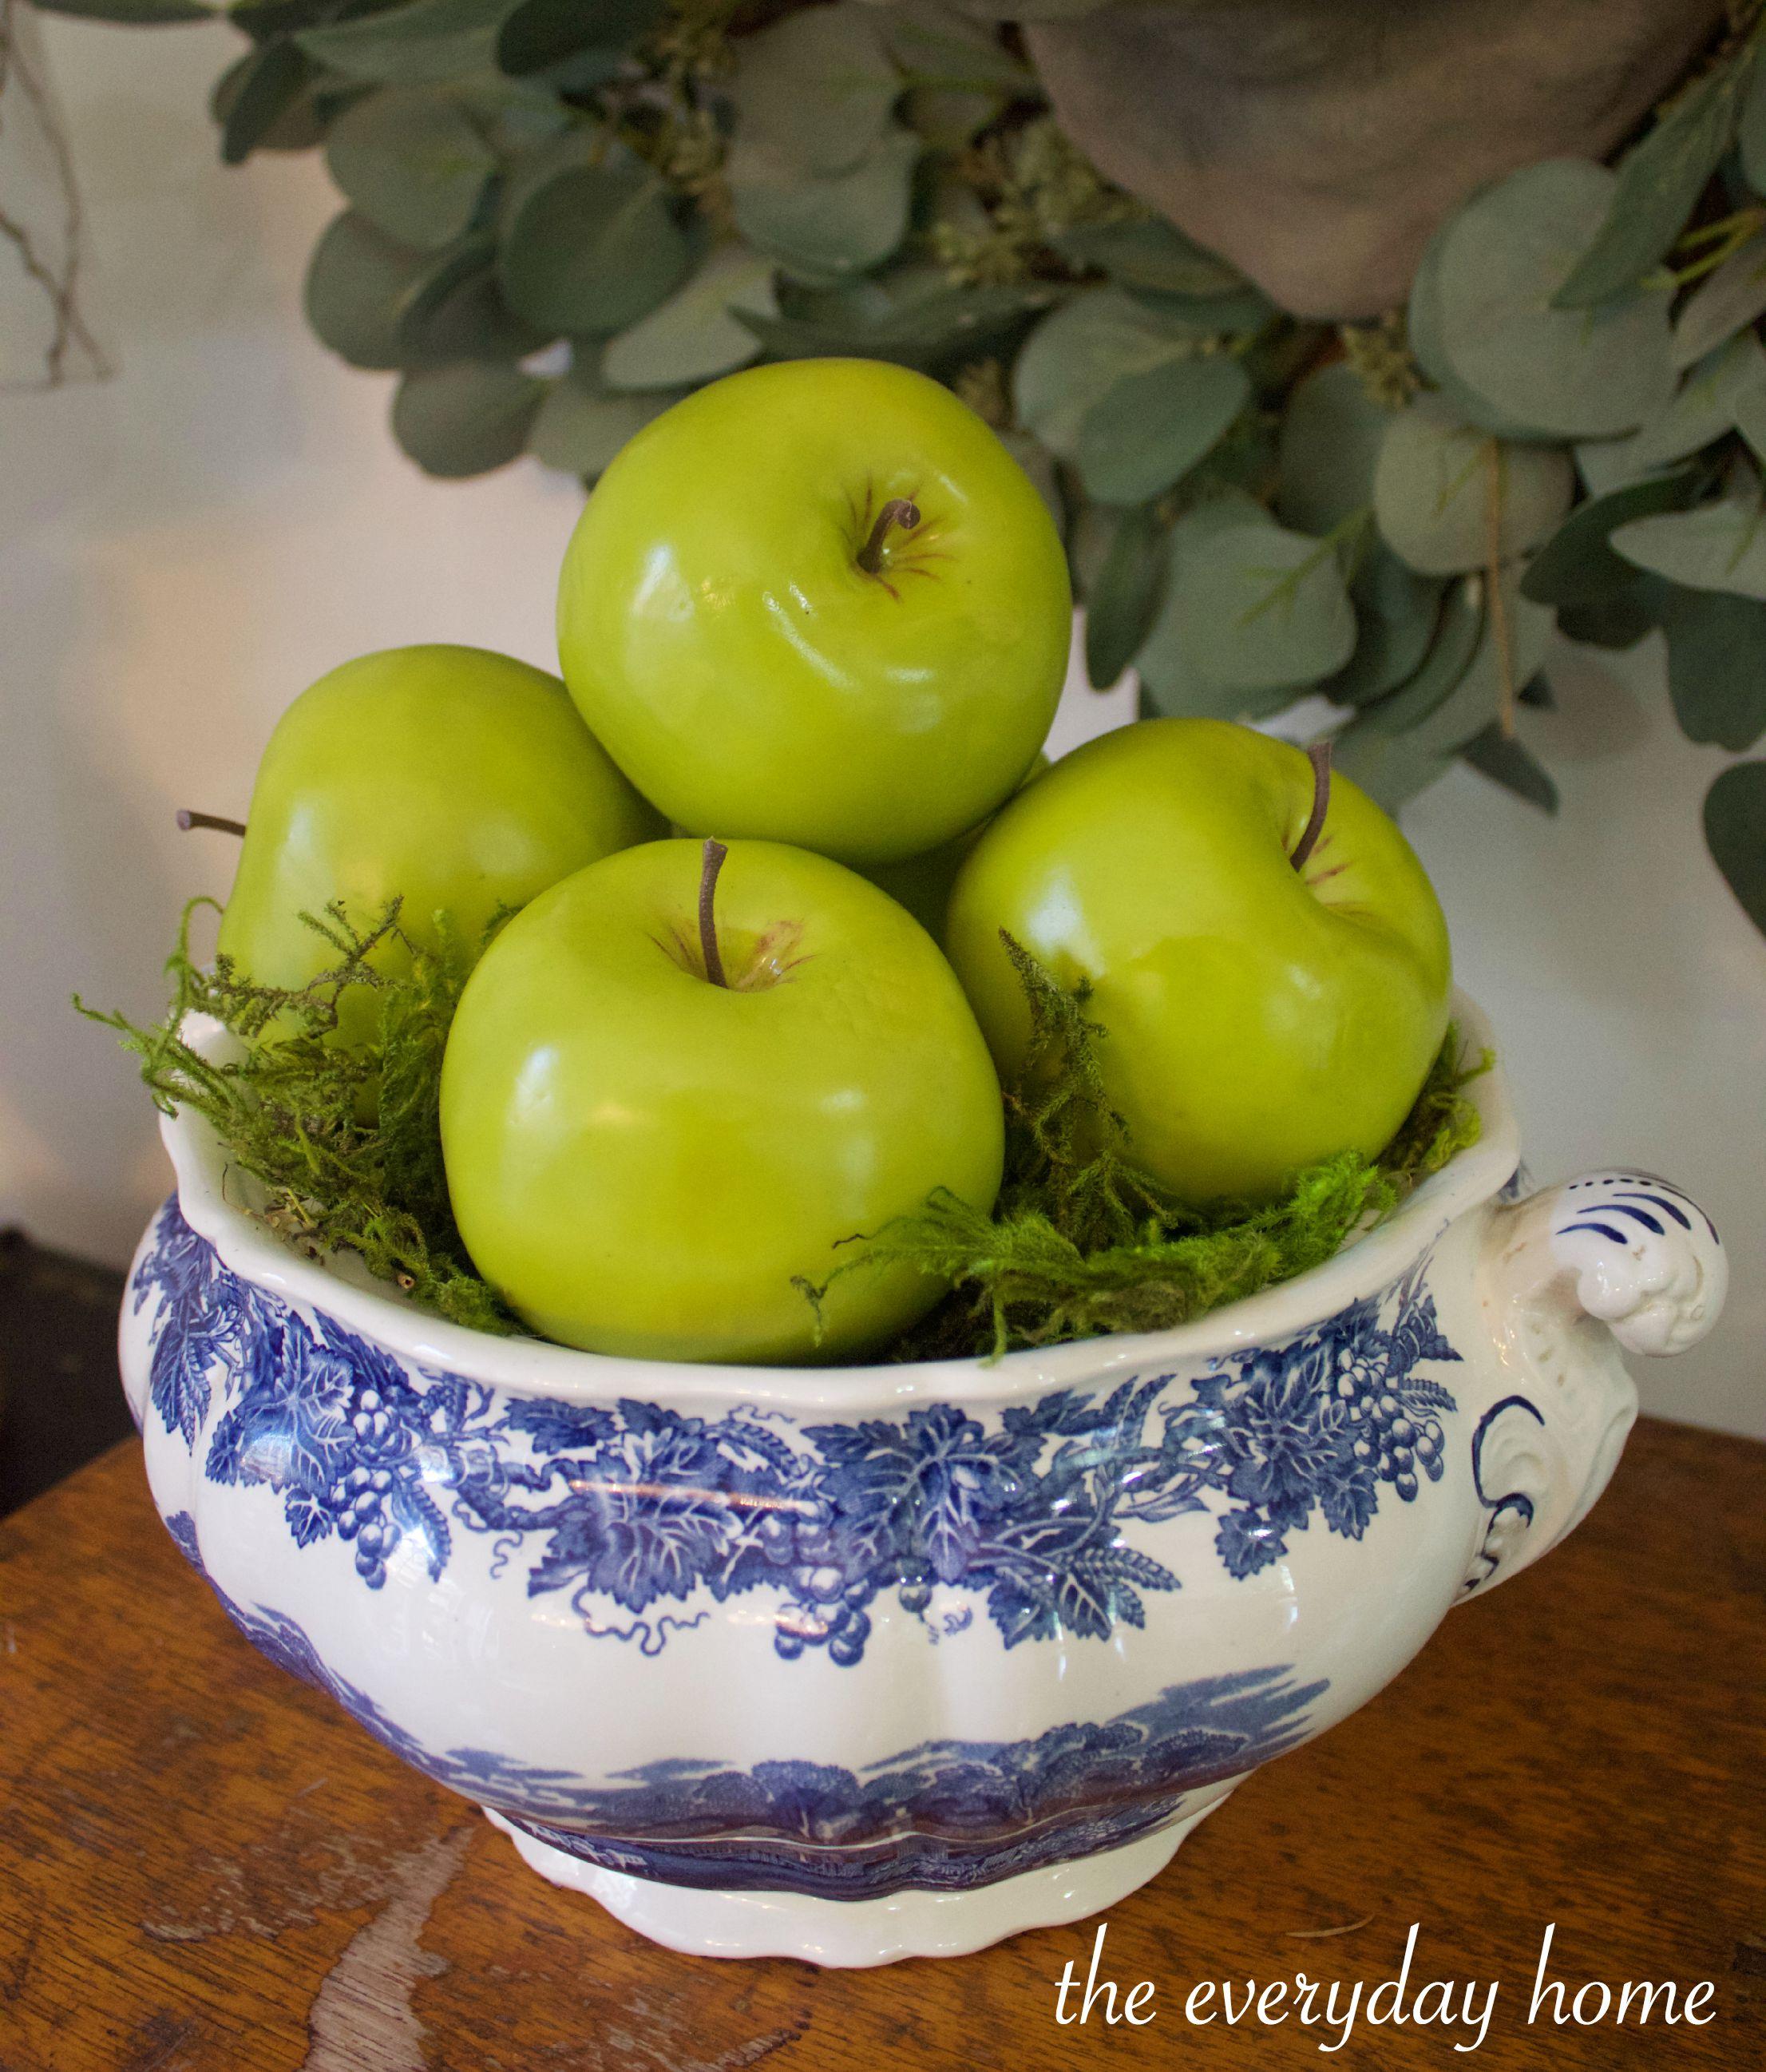 Green Apples in Blue Bowl | The Everyday Home | www.everydayhomeblog.com